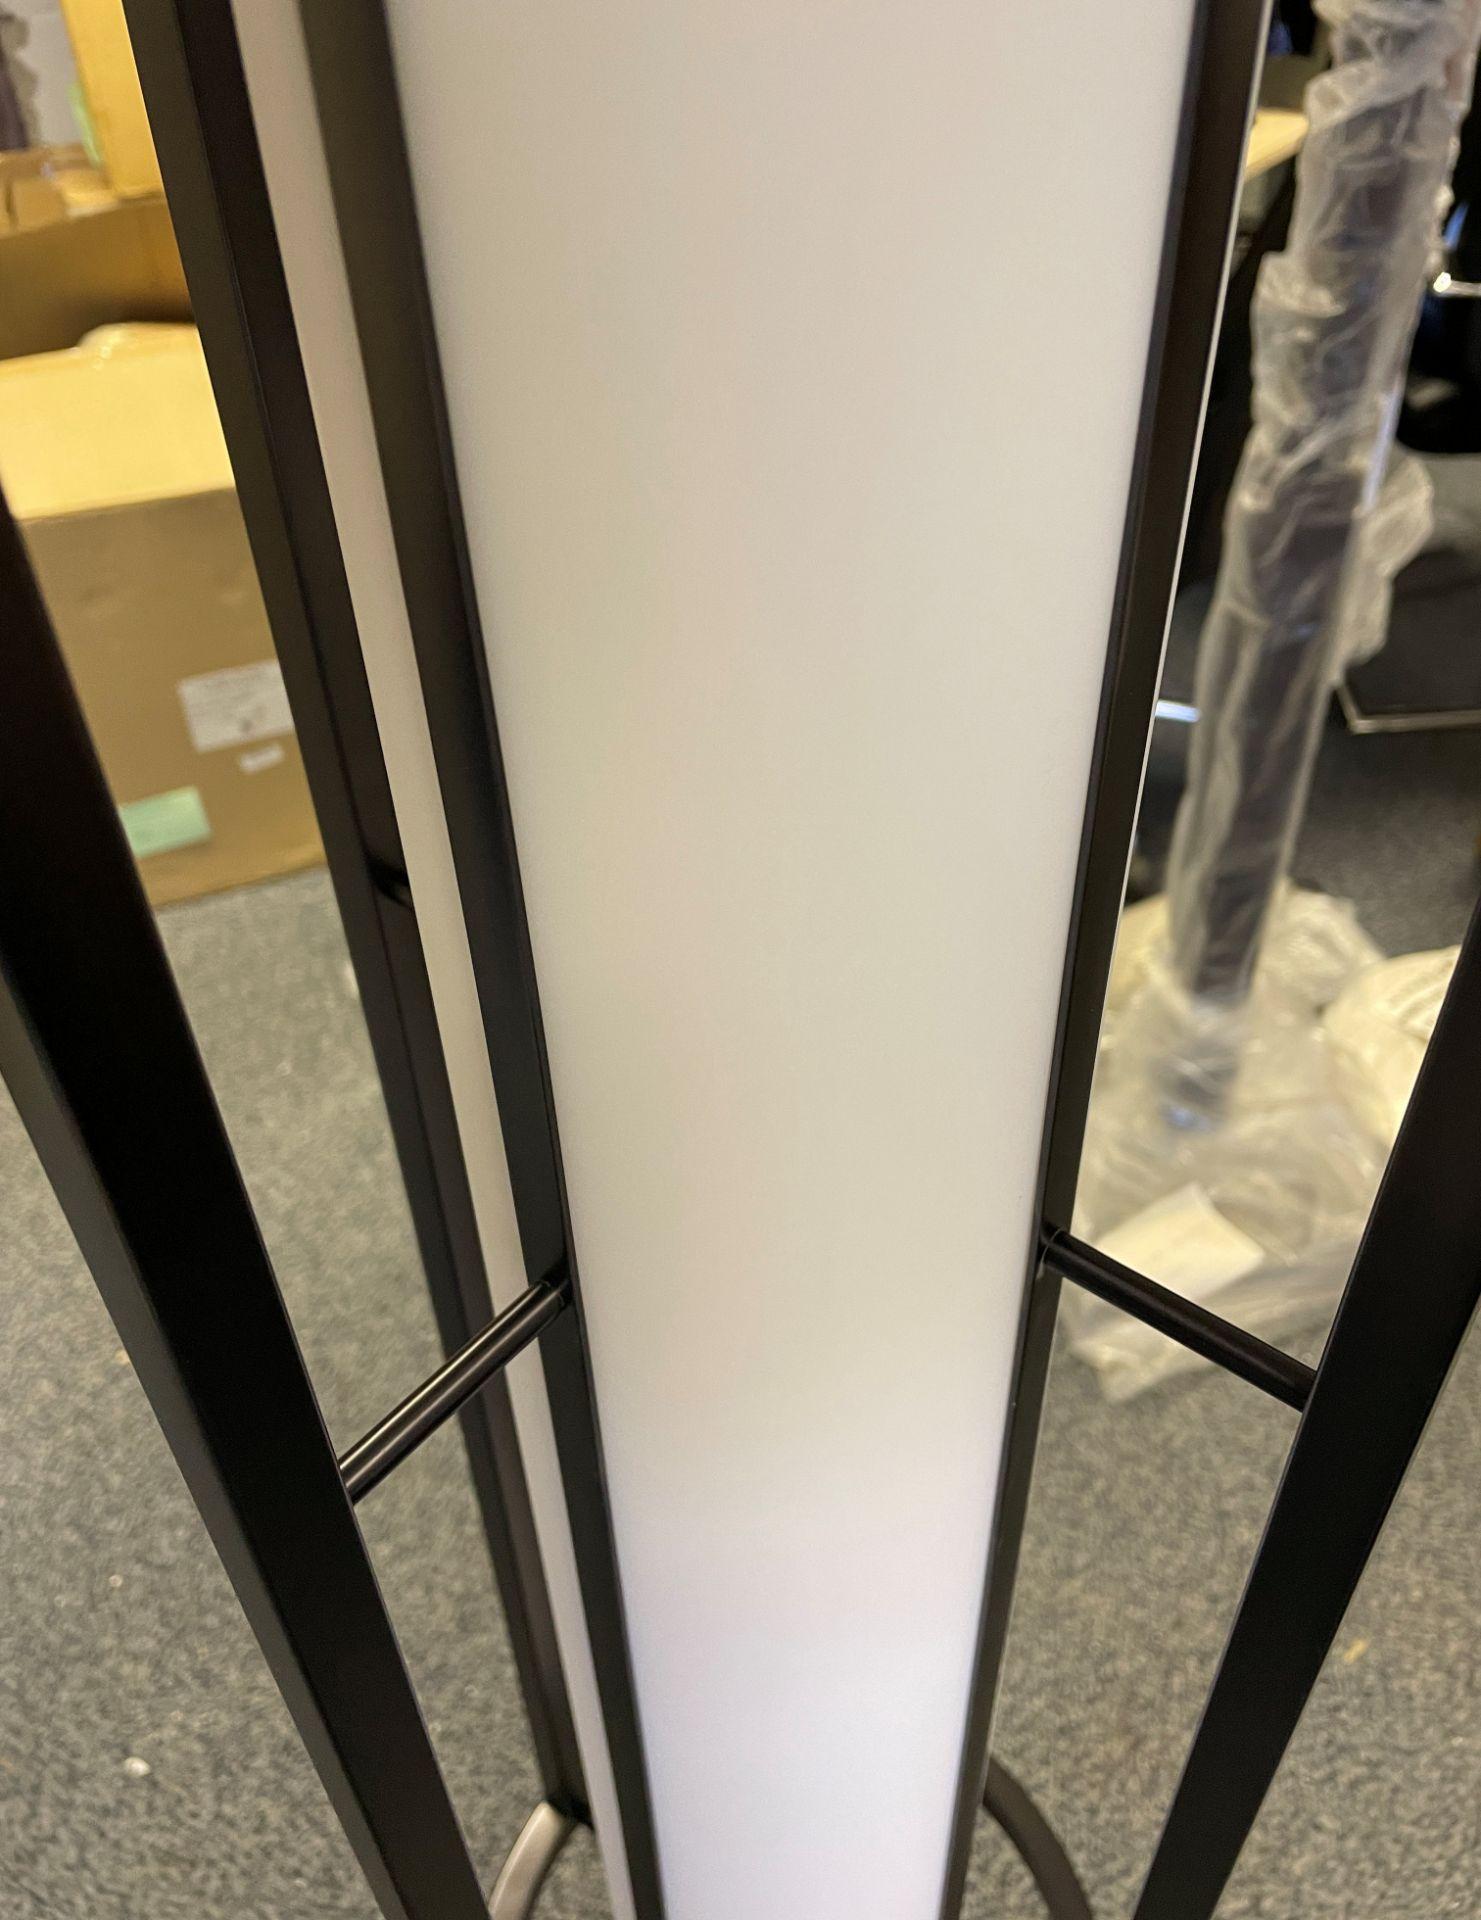 1 x Chelsom Art Deco Style Floor Lamp in Black/Bronze Height 161cm x 30cm Diameter - Ref: CHL197 - - Image 8 of 10